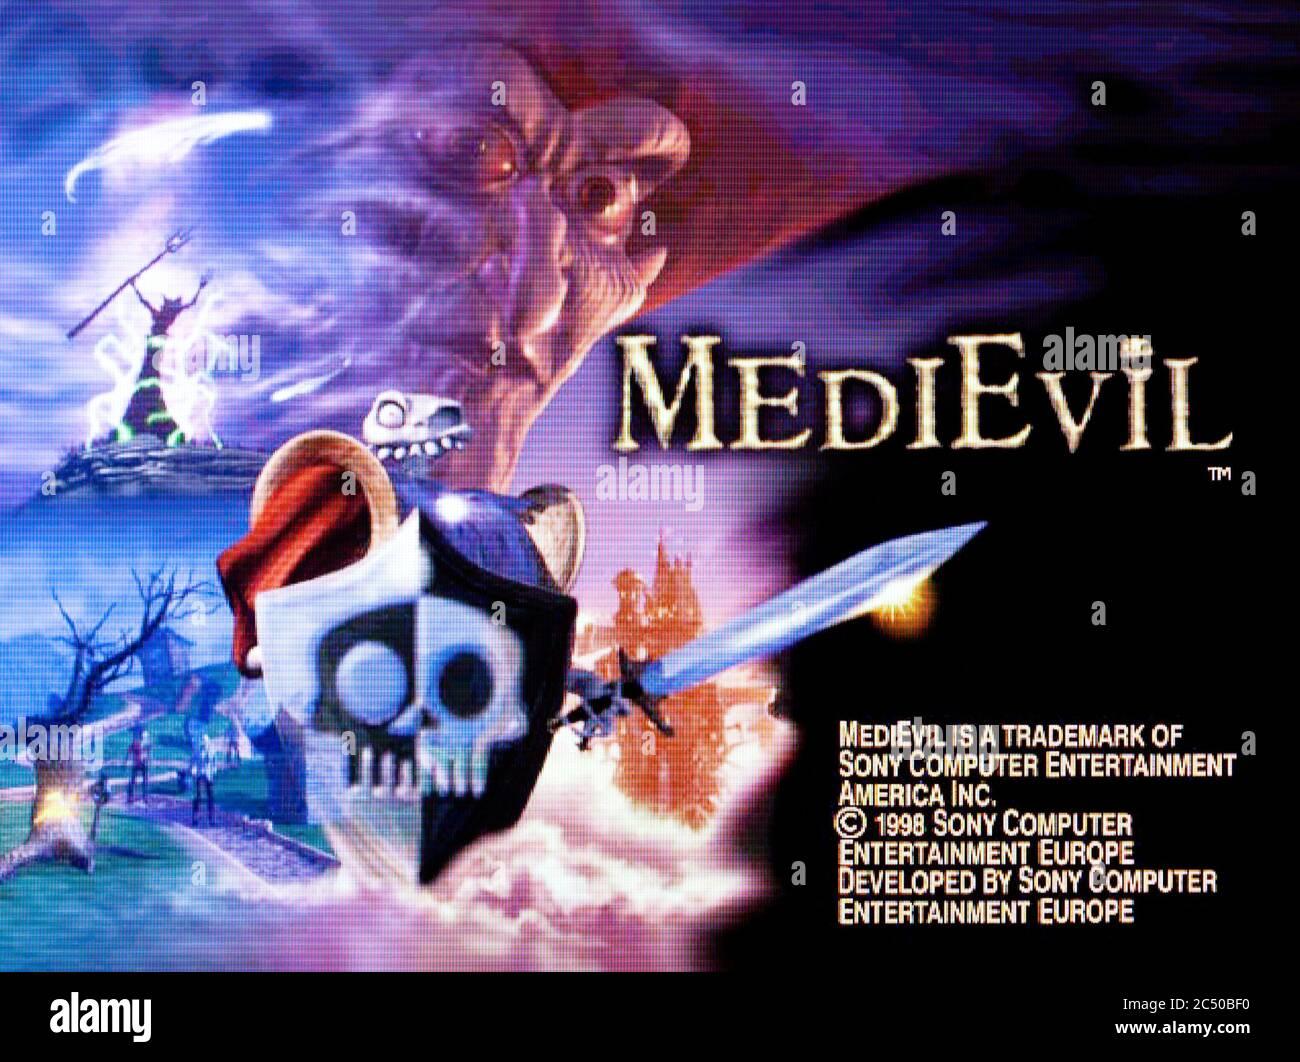 MediEvil - Sony PlayStation 1 PS1 PSX - solo para uso editorial Foto de stock